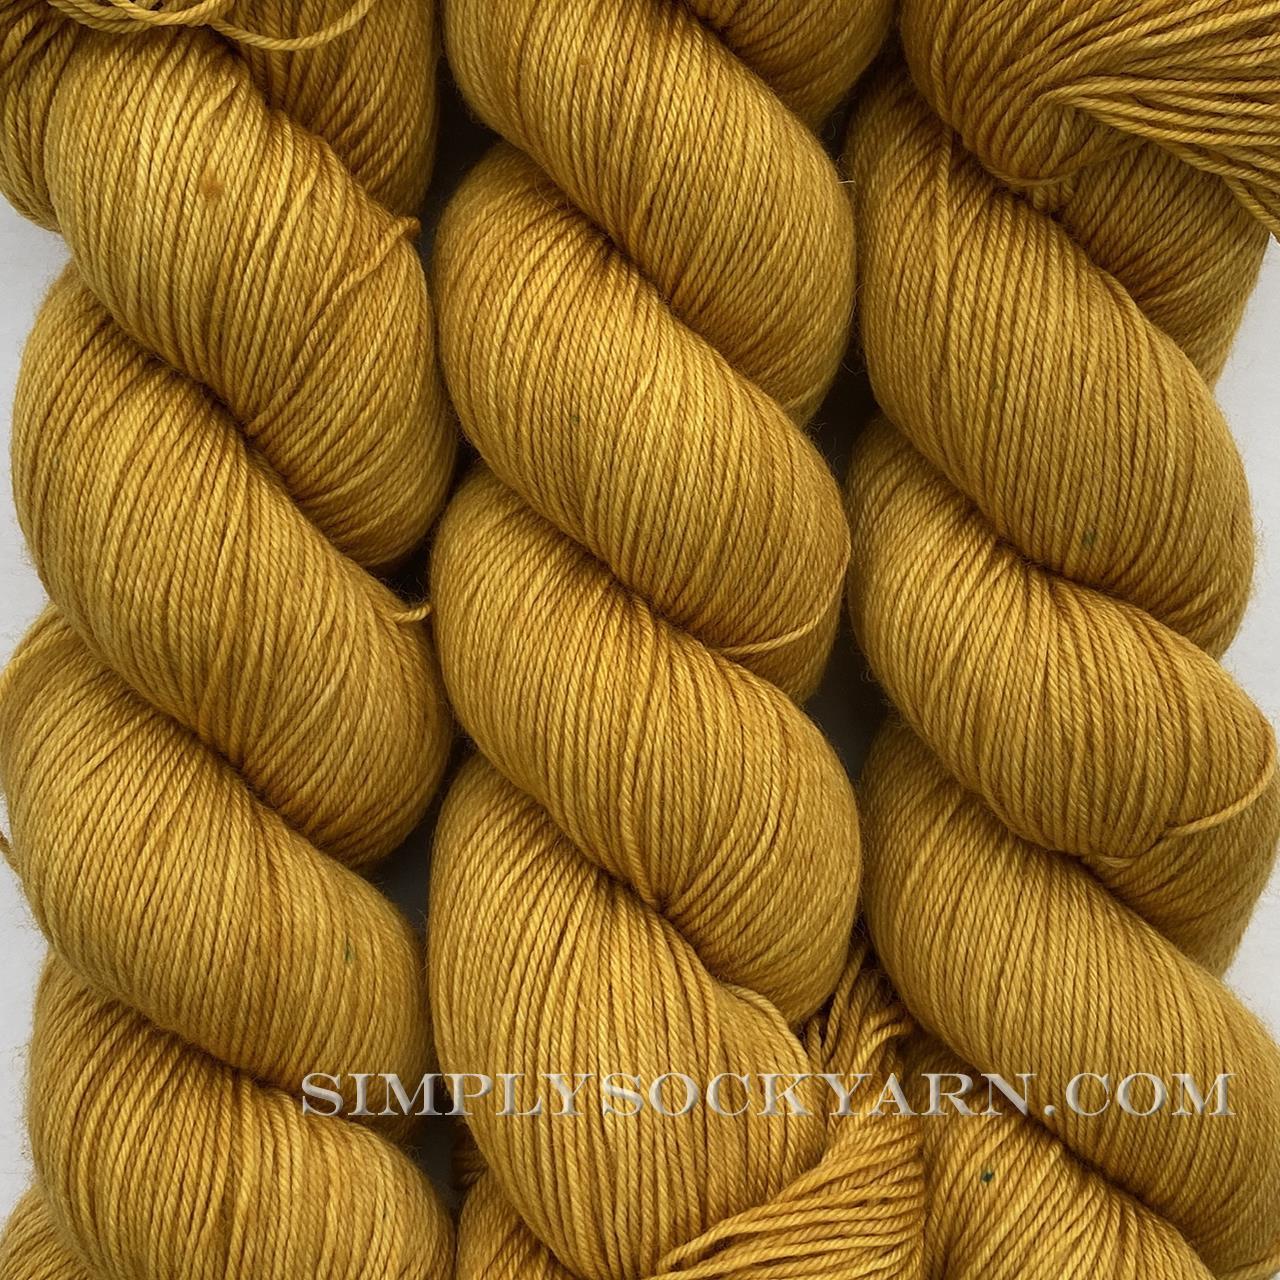 LITLG Sock Harvest -